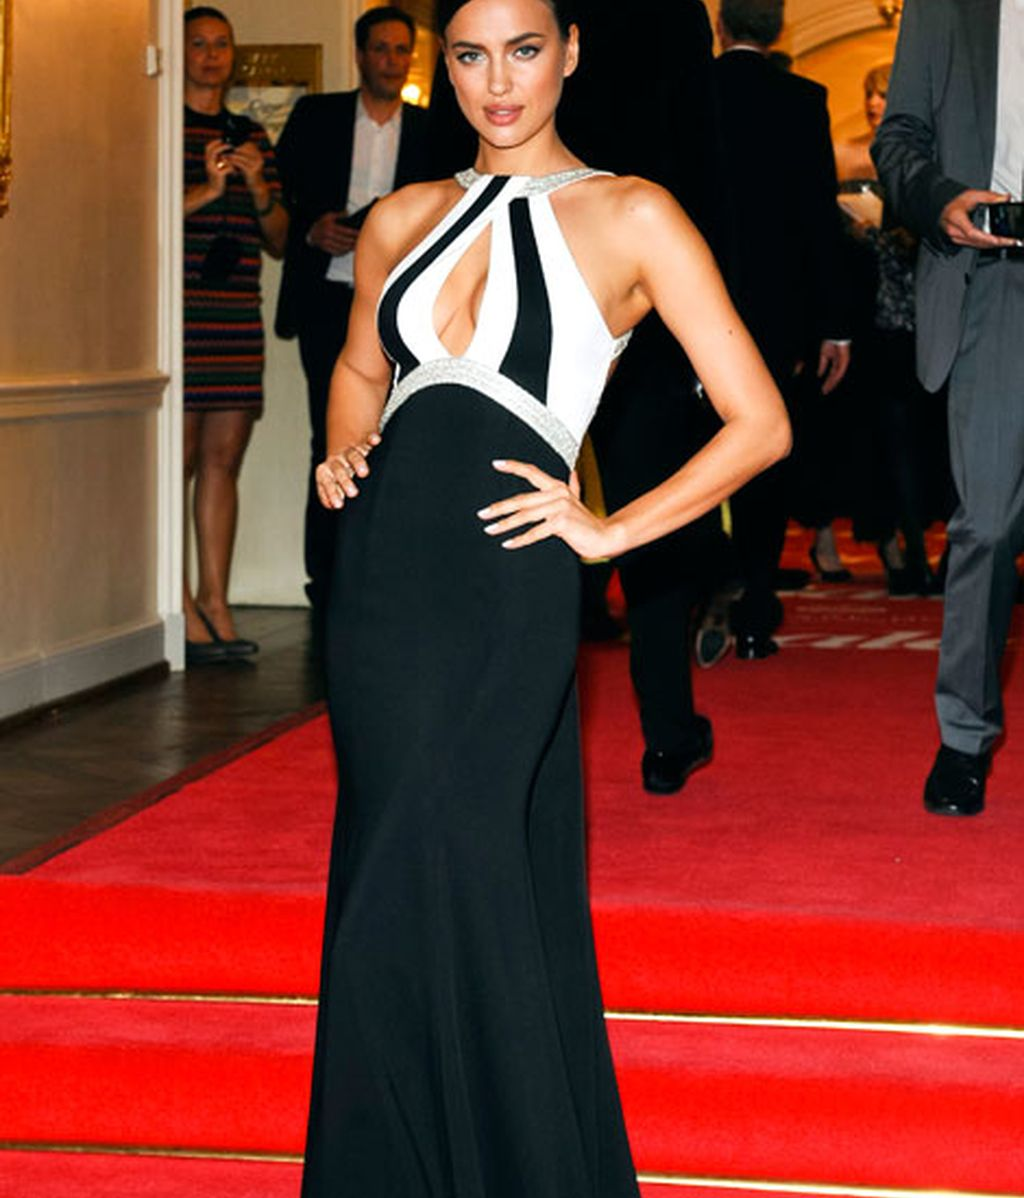 Irina Shayk, espectacular de gala